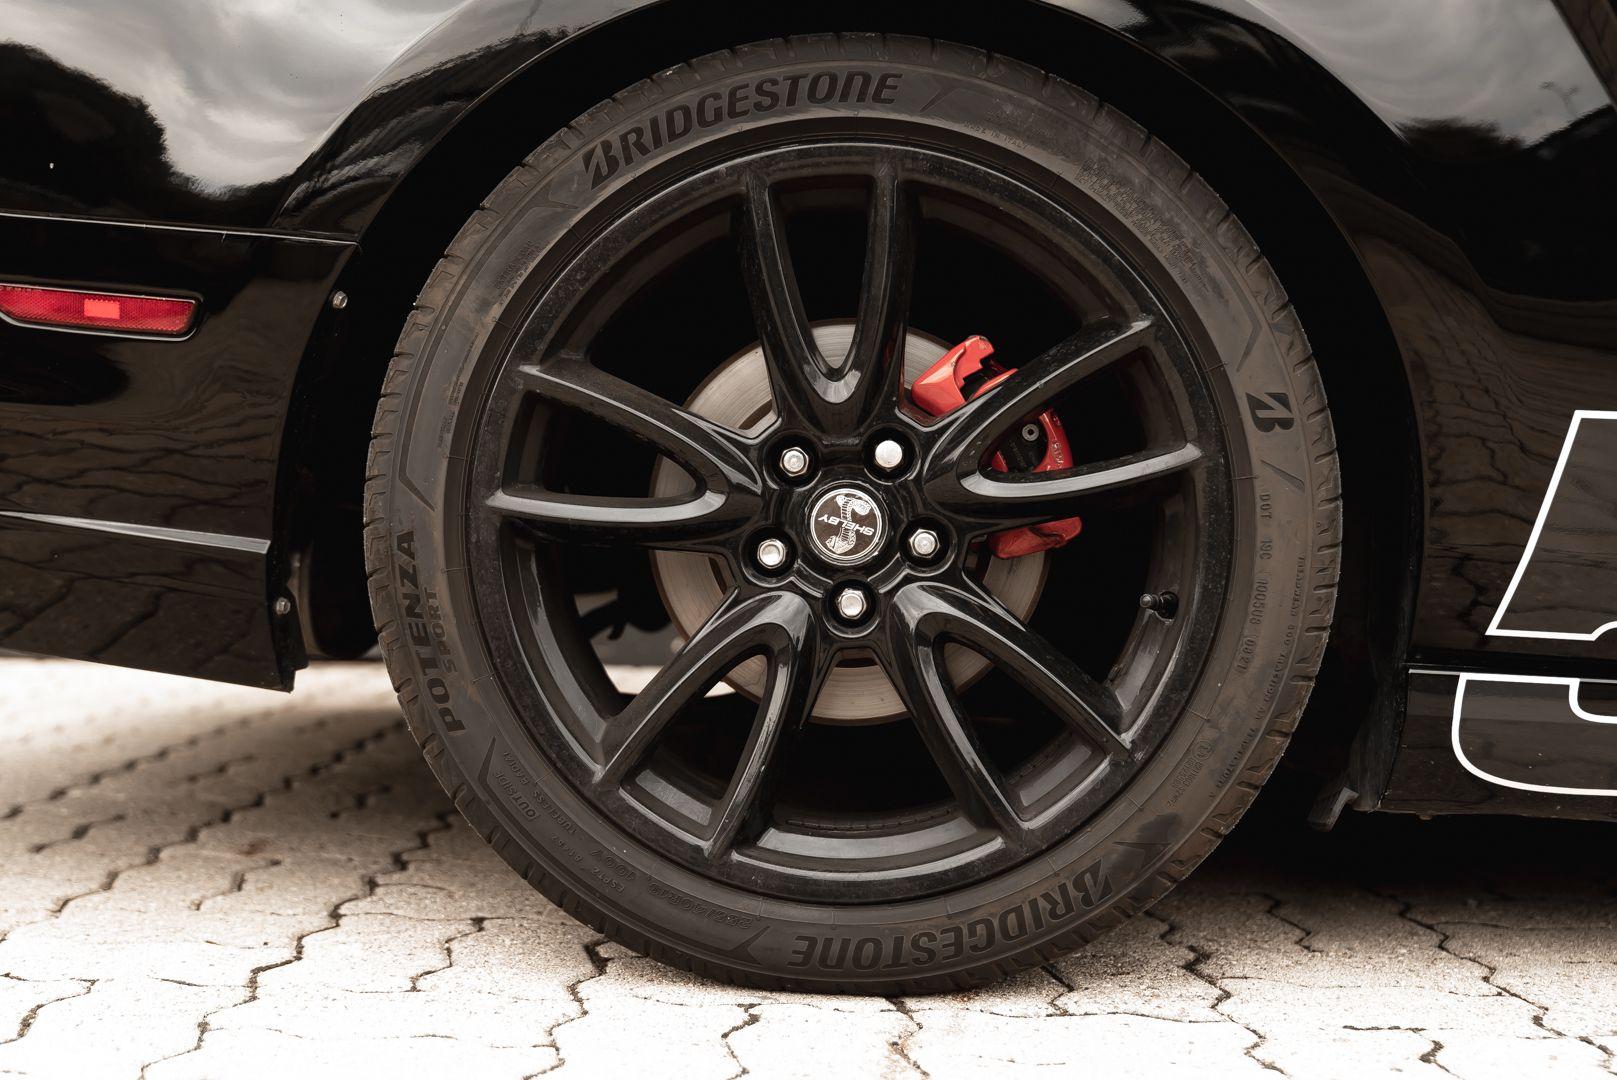 2012 Ford Mustang 5.0 V8 82066